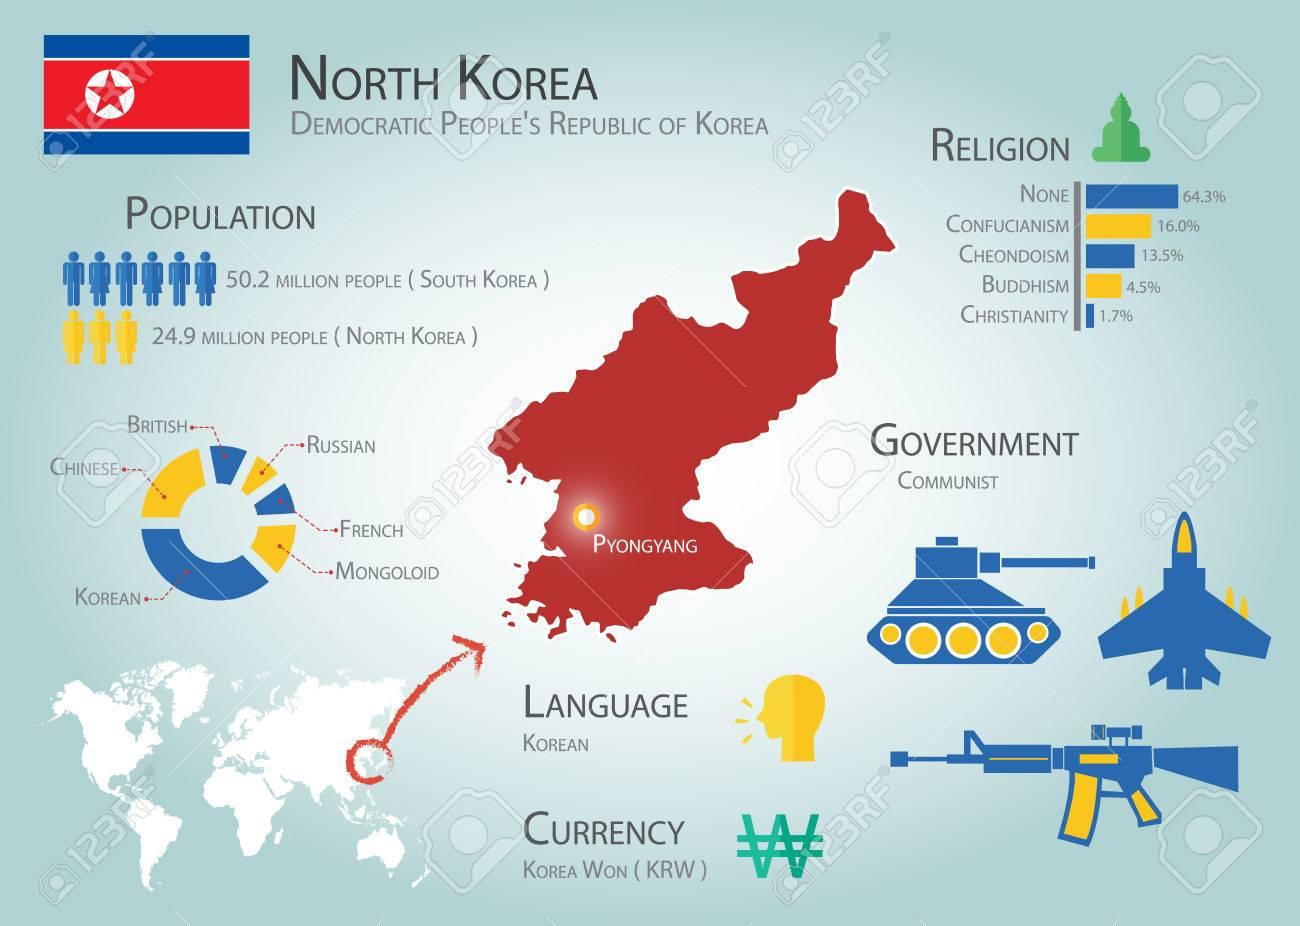 Korea North Cliparts And Vectors Illustration Korea Royalty People's Democratic Republic Infographics 52765697 Stock Image Free Of